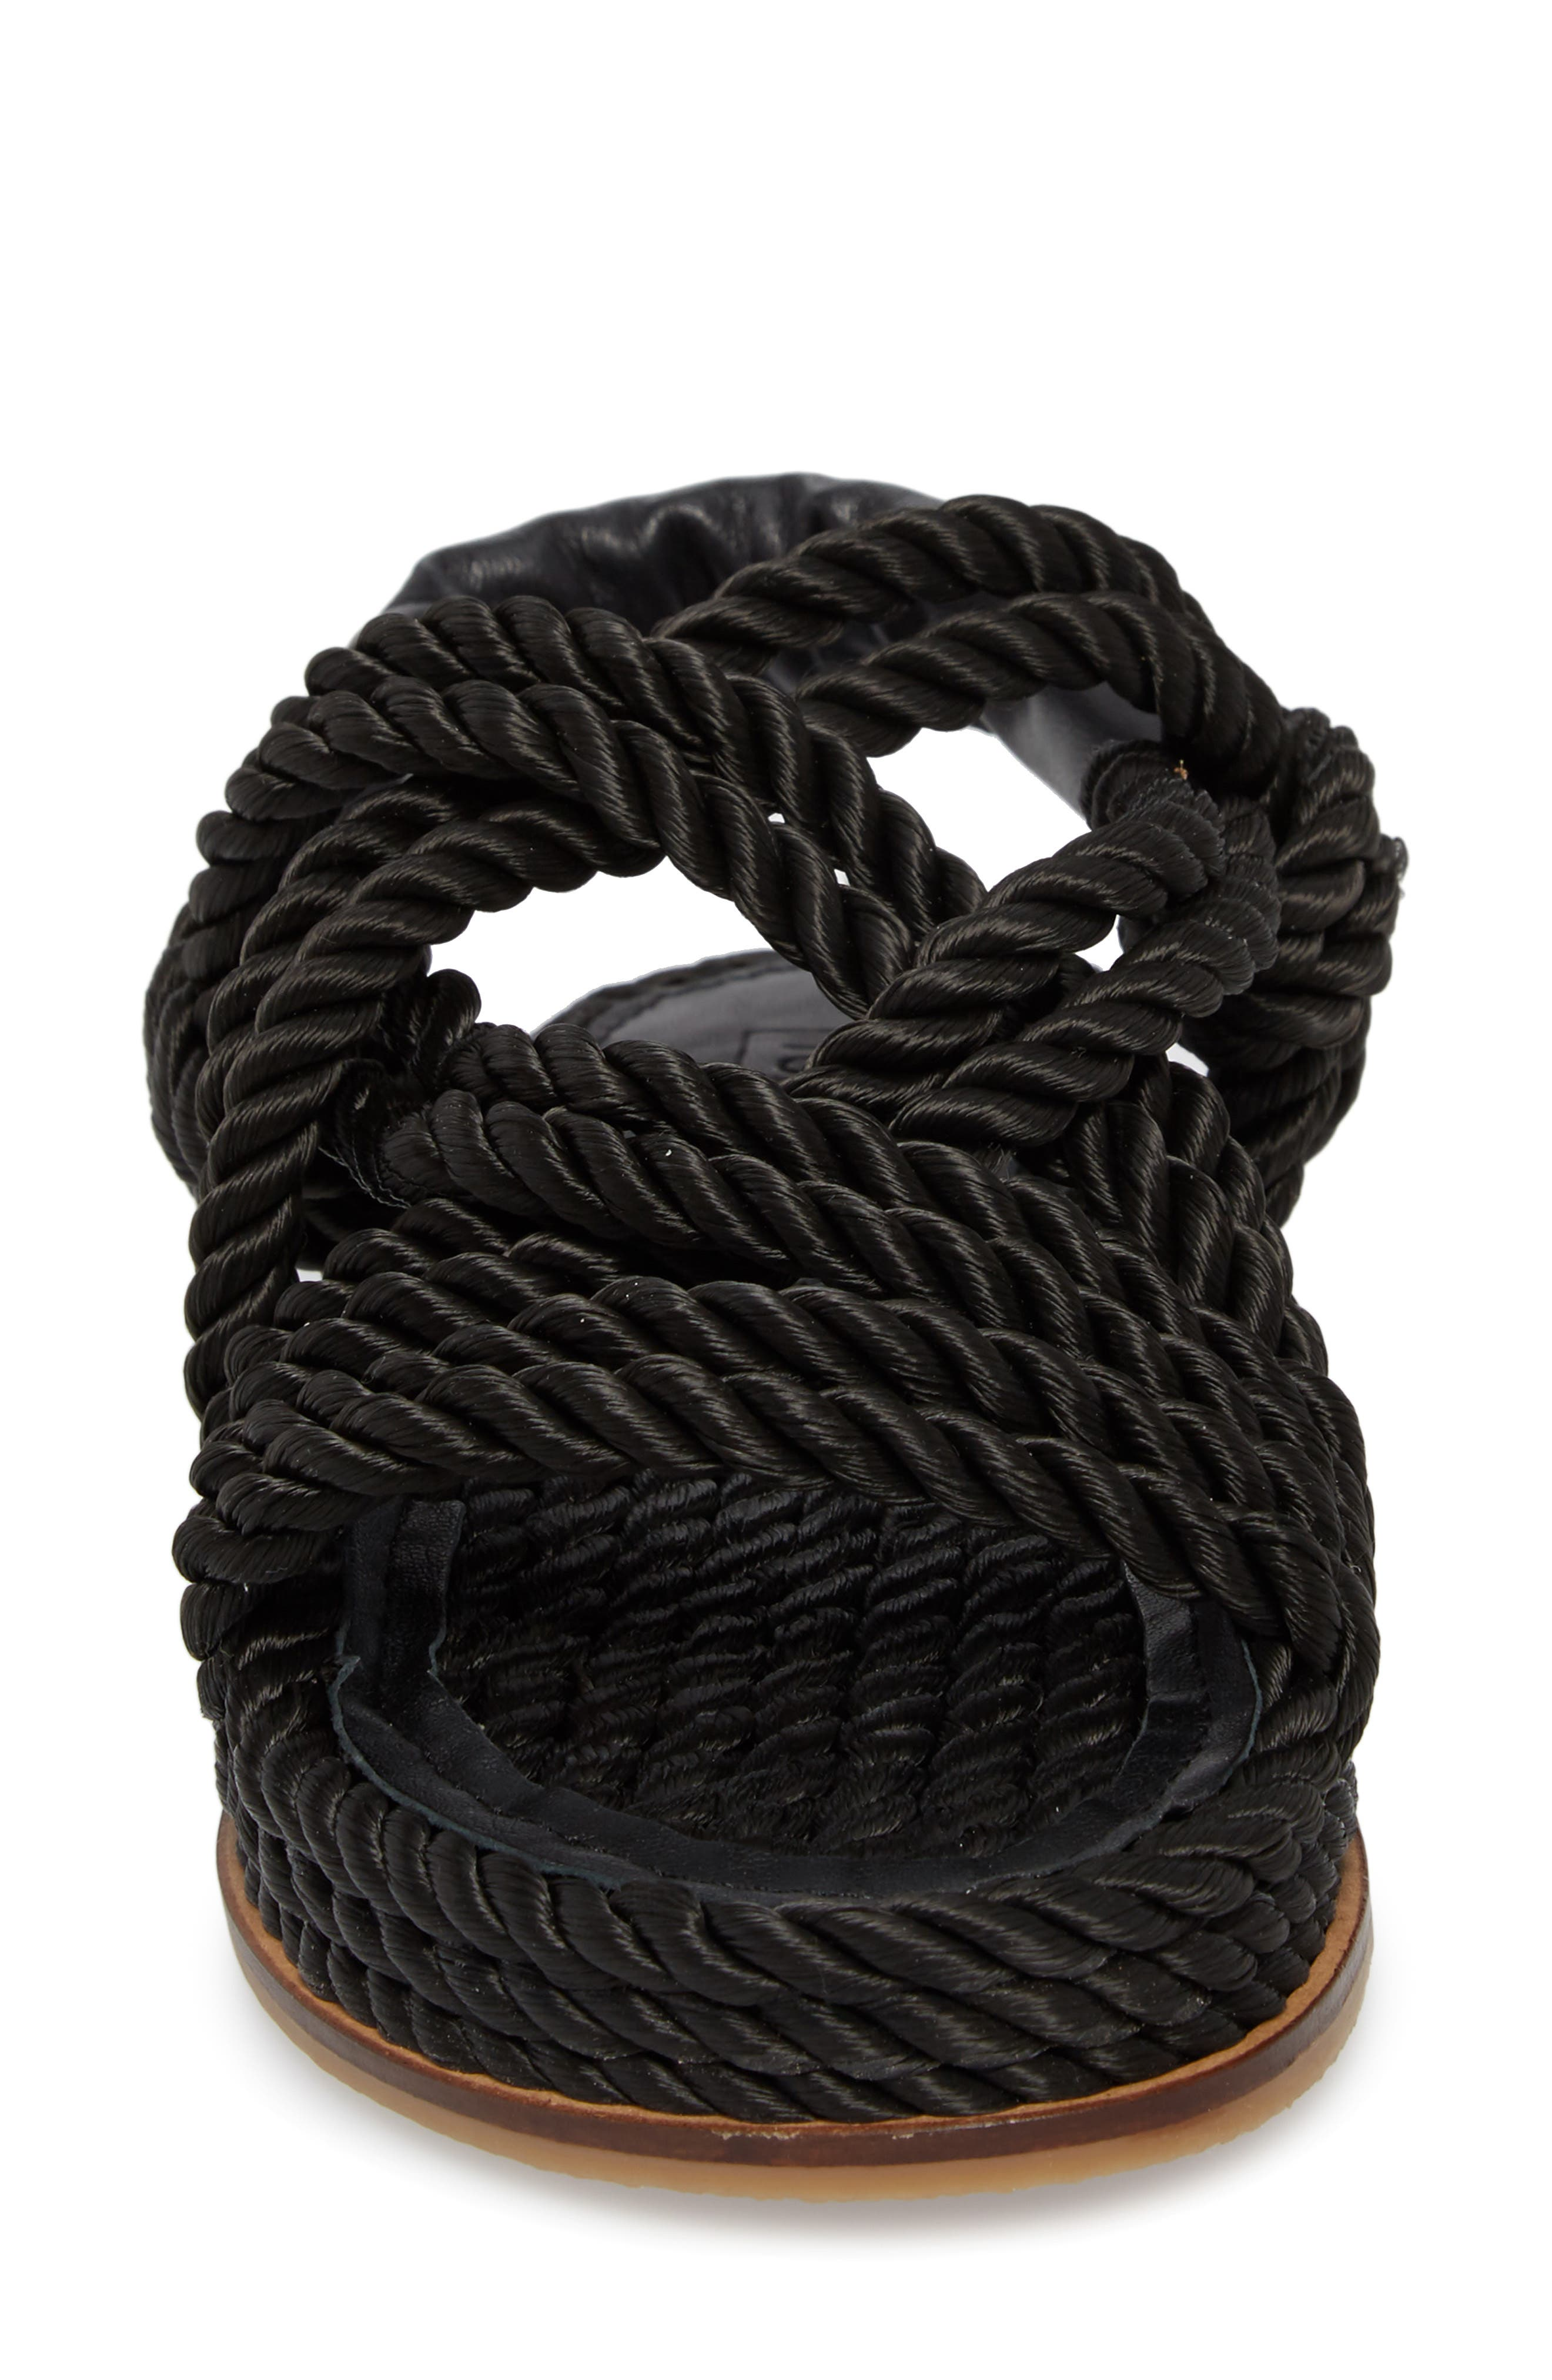 Fiesta Rope Flat Sandal,                             Alternate thumbnail 7, color,